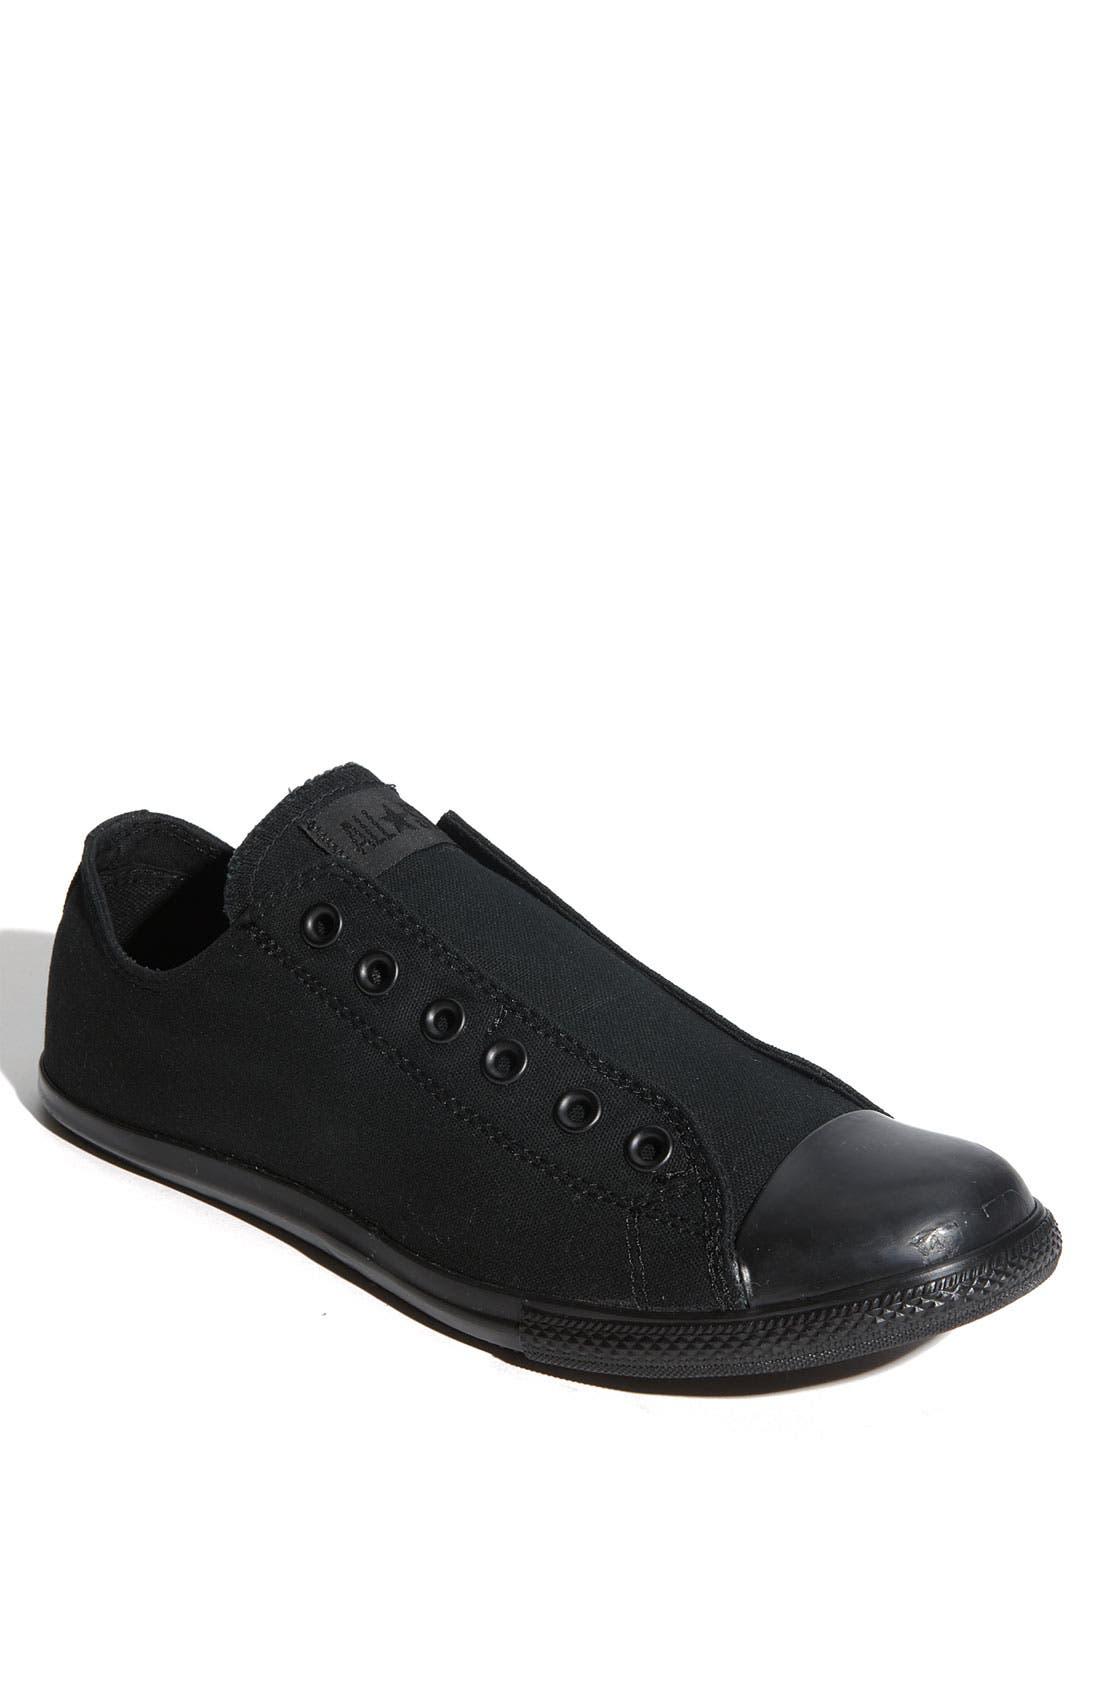 Alternate Image 1 Selected - Converse Chuck Taylor® 'Slim' Low Top Canvas Sneaker (Men)